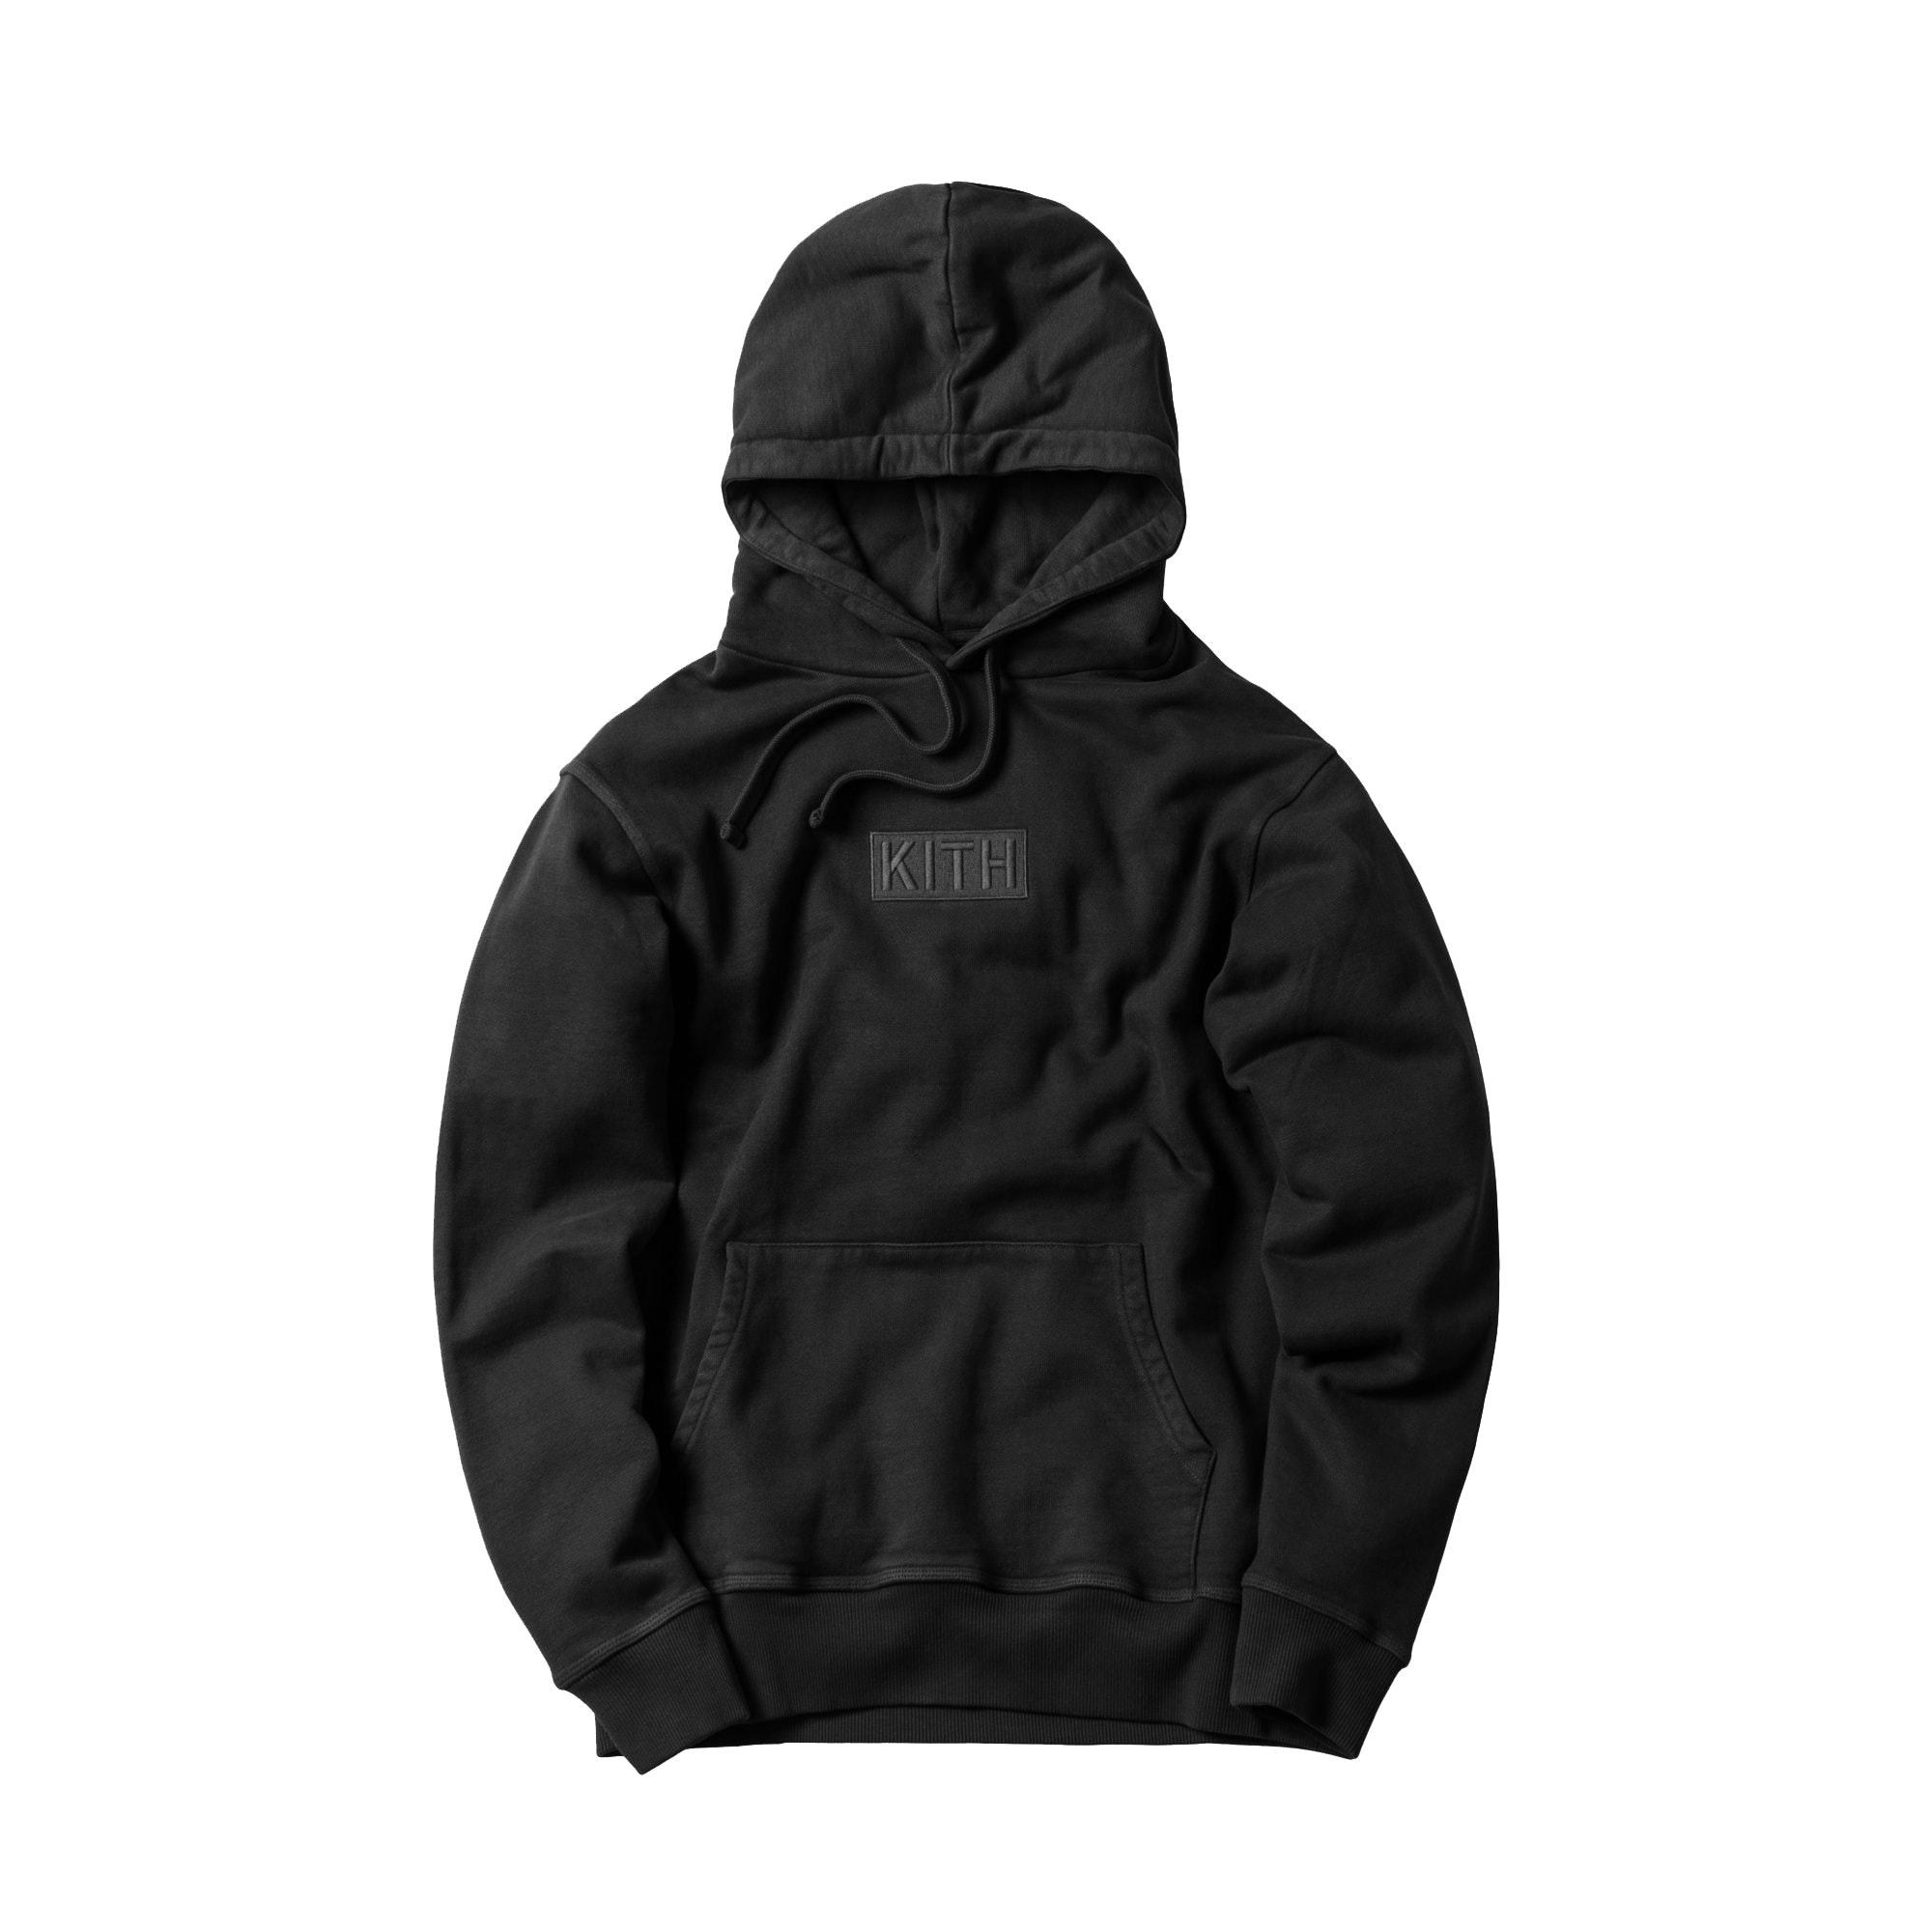 Kith Williams Classic Box Black On Blk Hoodie Sweatshirt BOGO Large L New Tags